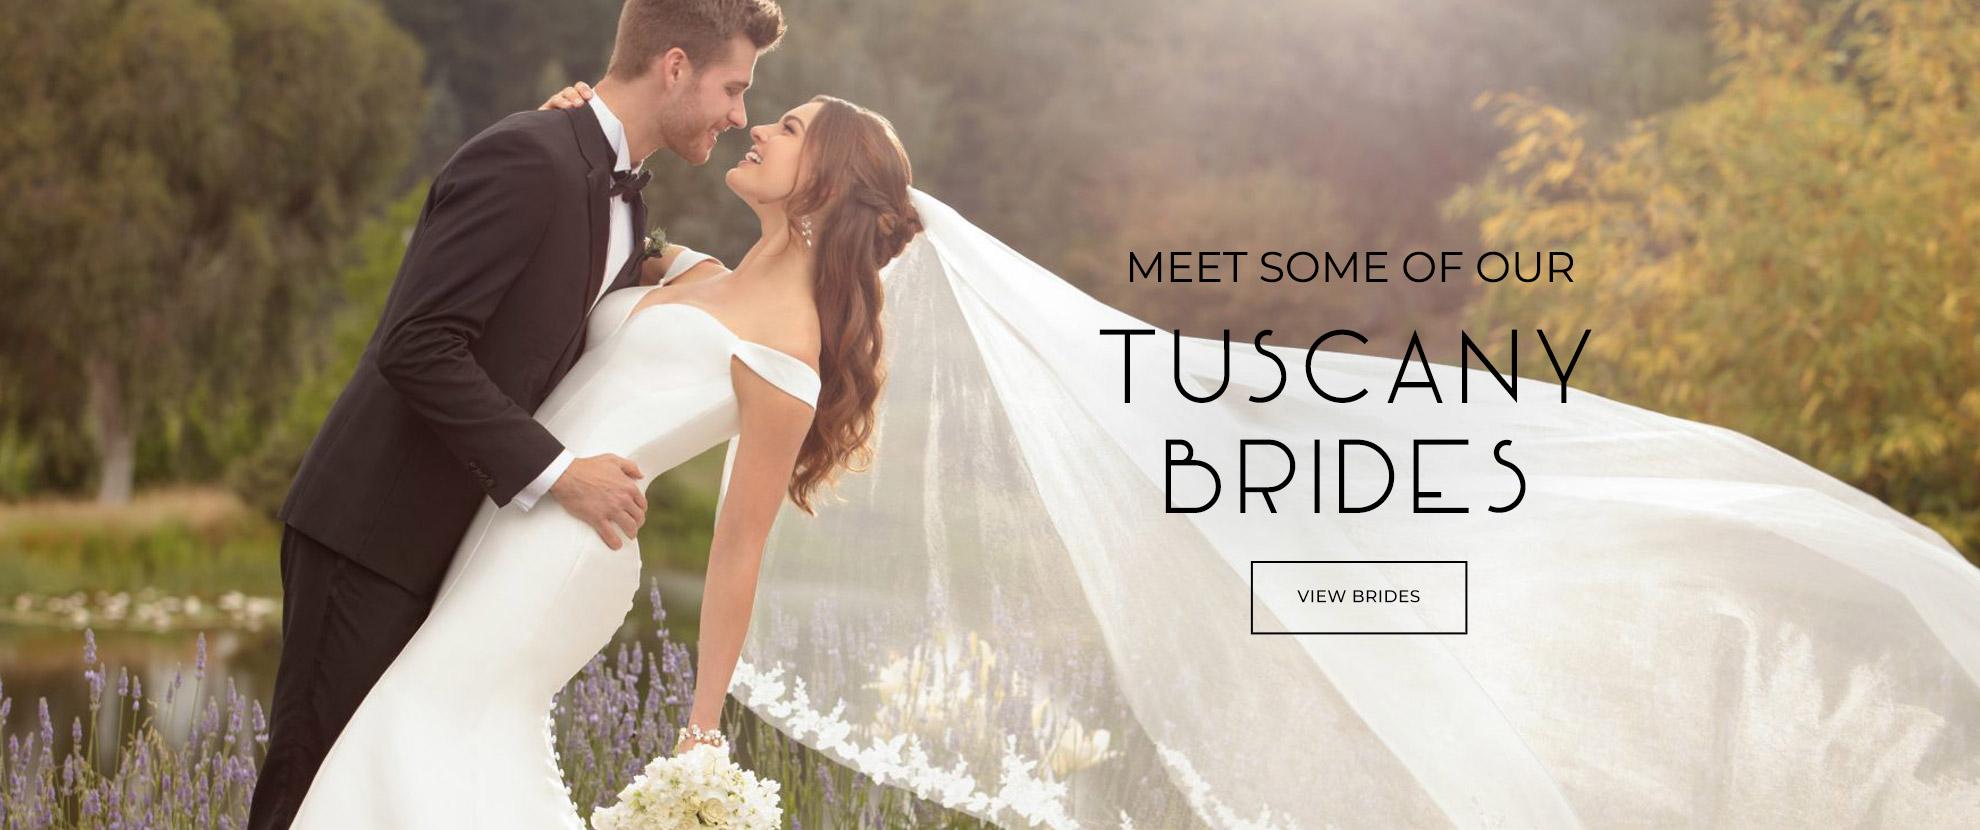 Wedding Dresses Perth Wedding Gowns Tuscany Bridal,Party Wear Maria B Wedding Dresses For Girls 2019